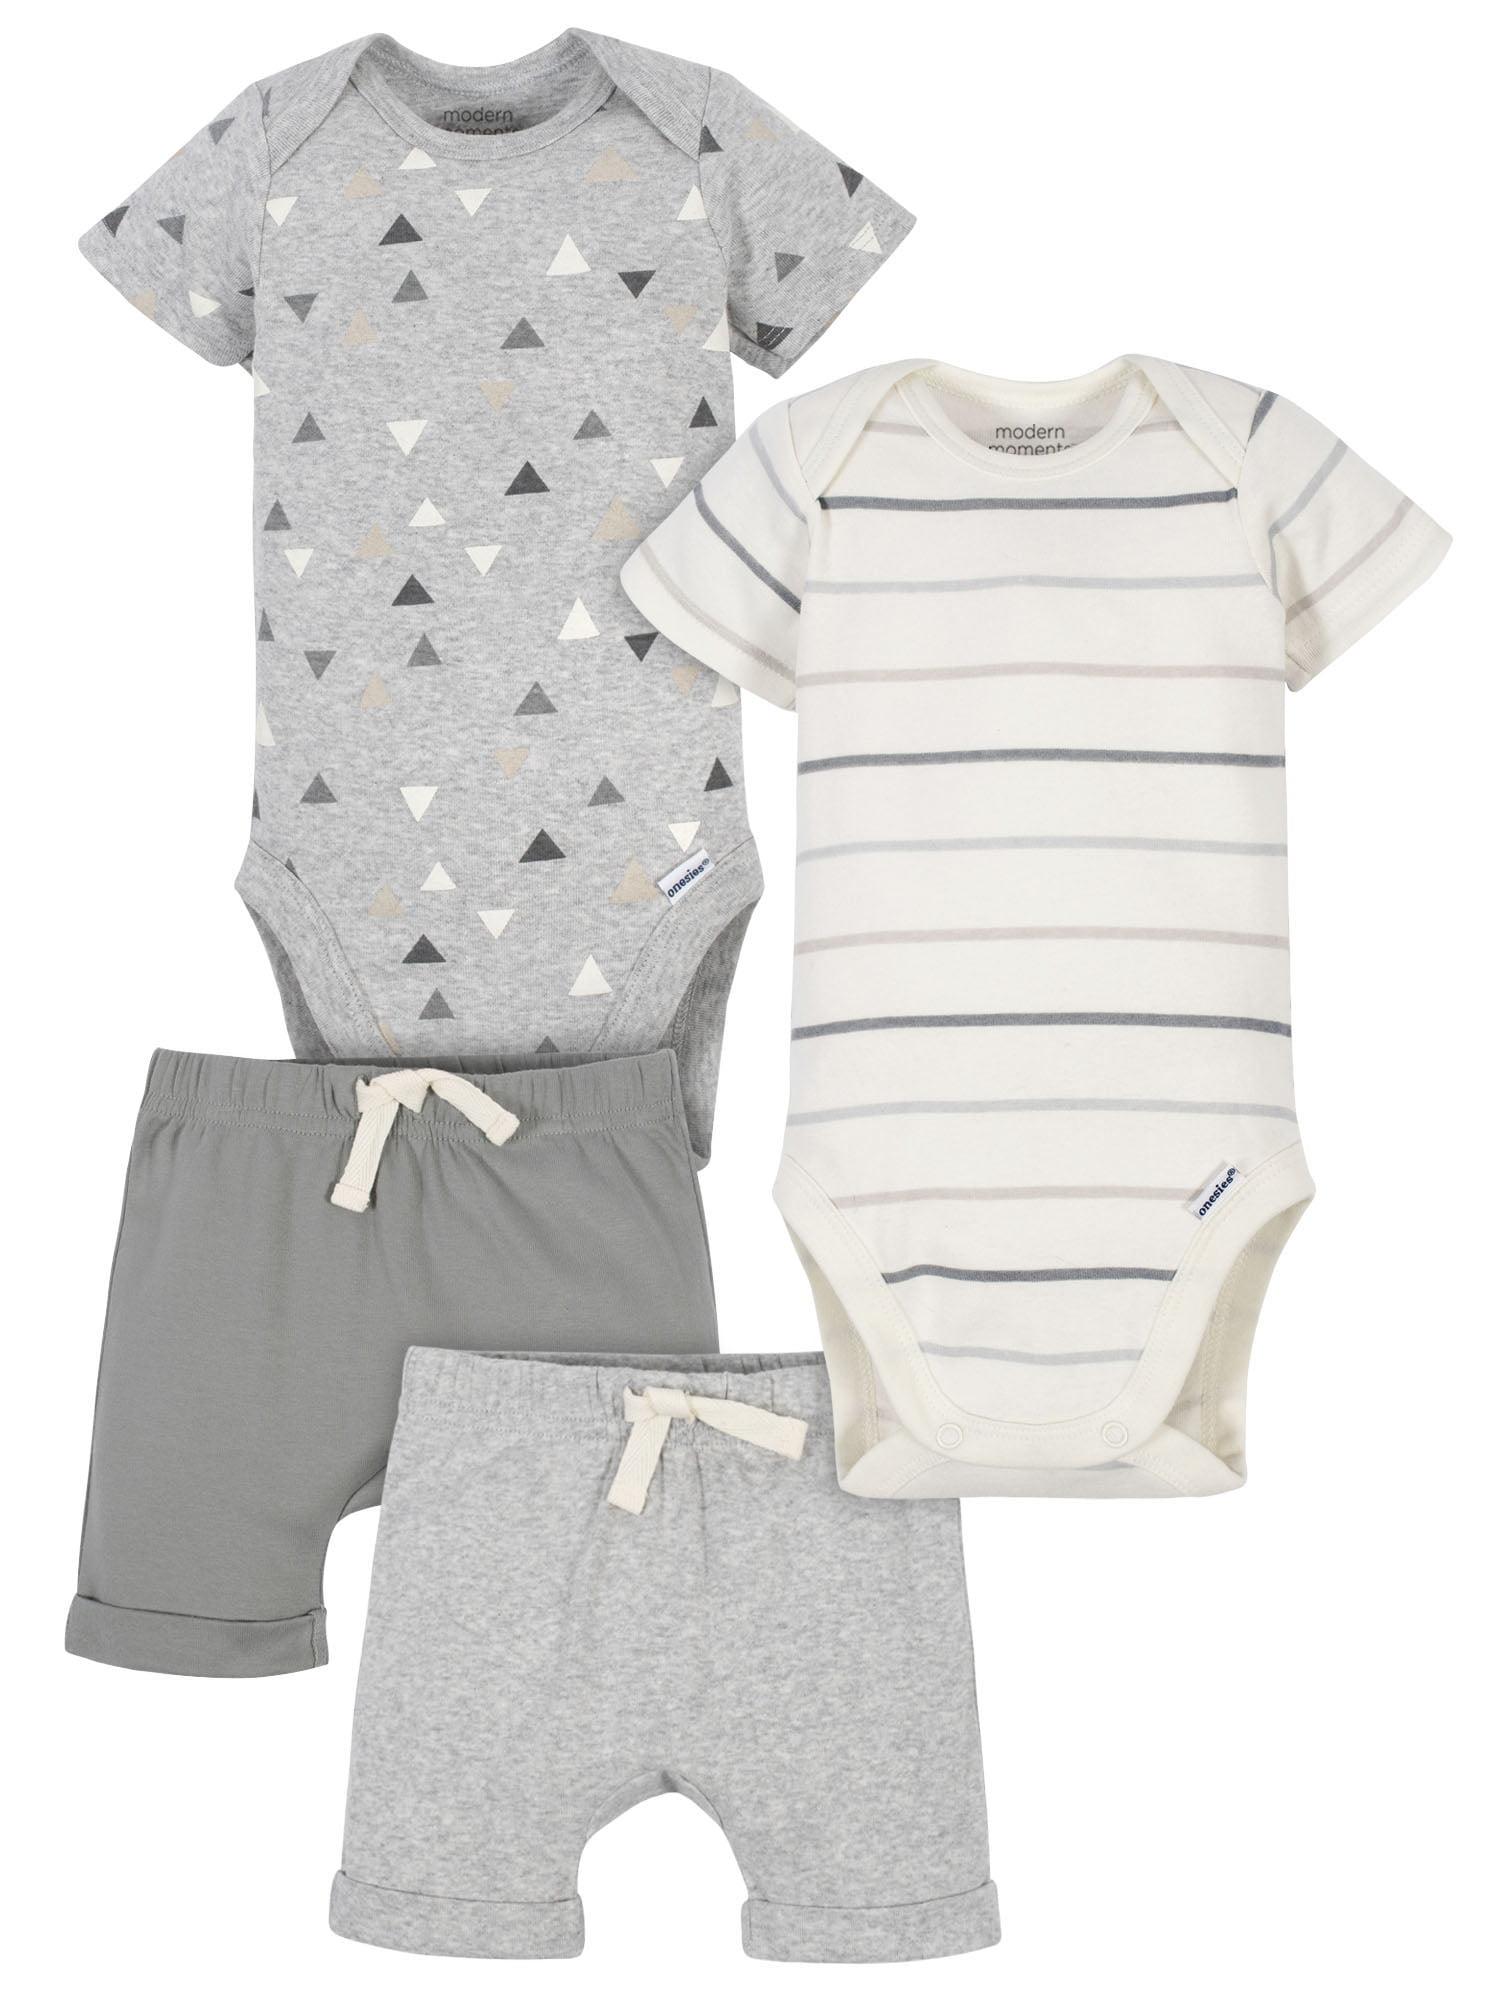 Unicorn Tears Baby Onesie O-Neck Short Sleeve Romper Clothes Organic Cotton Suit Kids Boys Girls